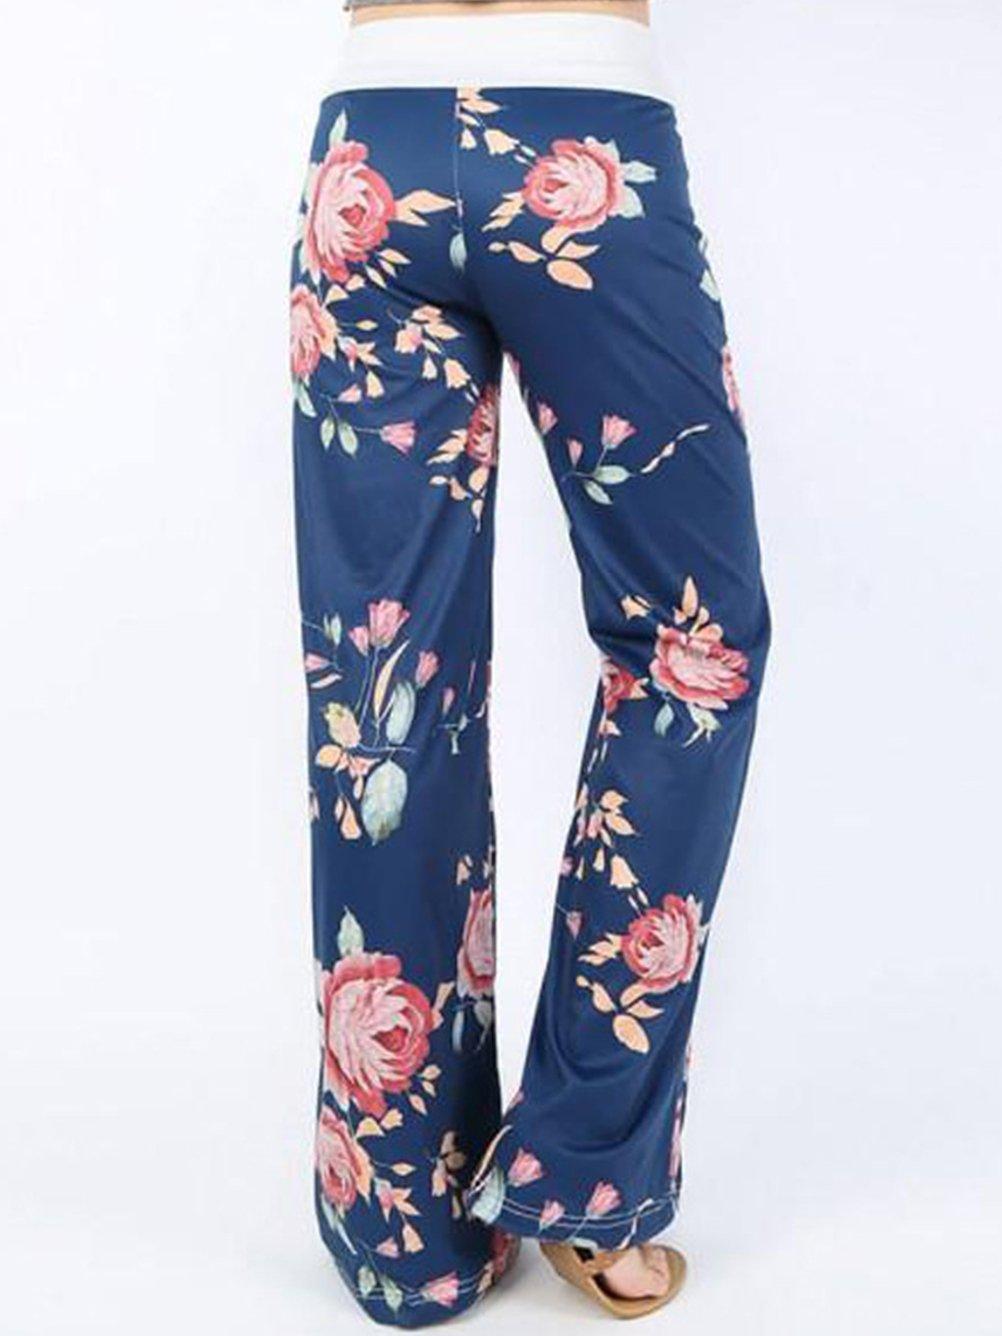 iChunhua Women's Comfy Stretch Floral Print Drawstring Palazzo Wide Leg Lounge Pants(M,Blue) by iChunhua (Image #2)